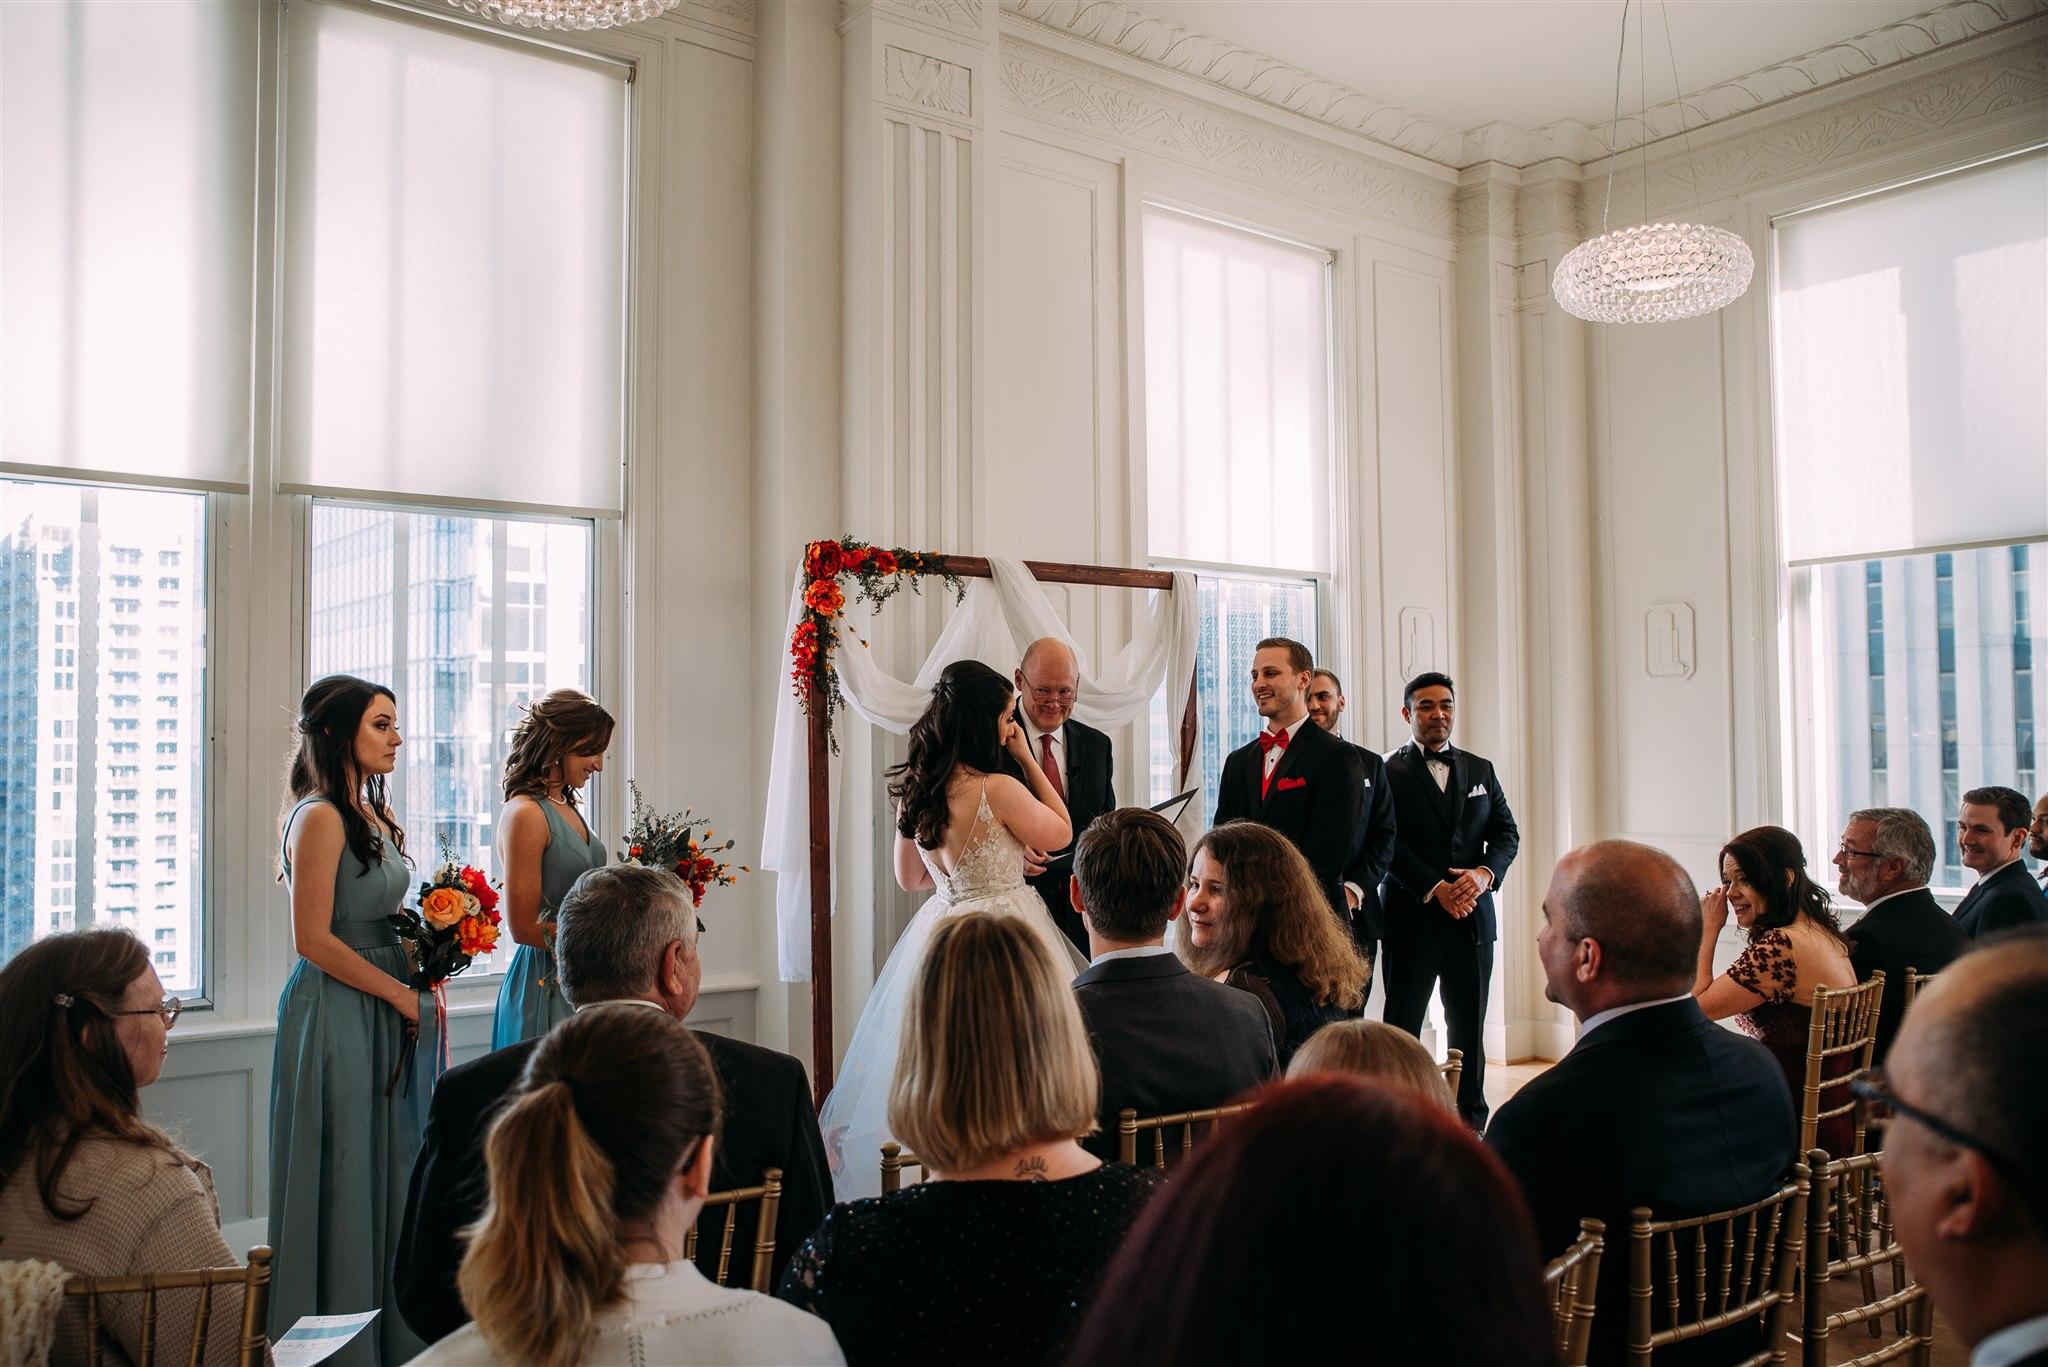 the cannon room wedding - raleigh wedding photographer - north carolina wedding photographer - durham wedding photographer - downtown raleigh wedding